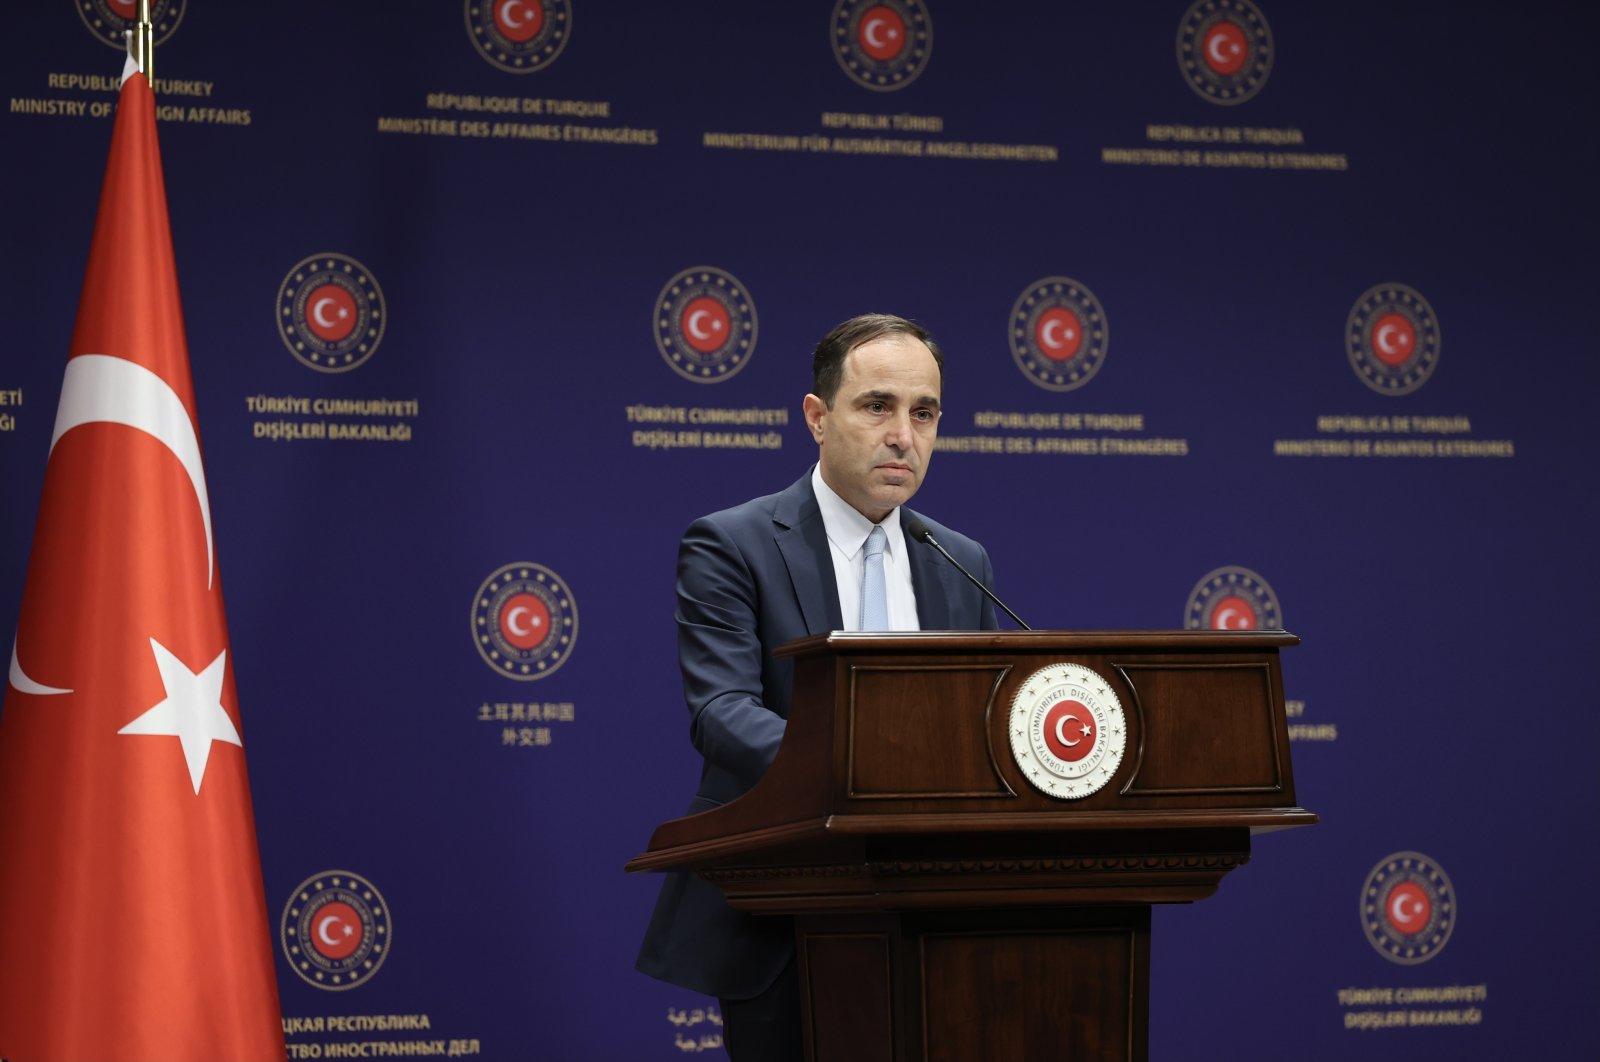 Foreign Ministry spokesperson Tanju Bilgiç listens during a press conference in Ankara, Turkey, June 25, 2021. (AA File Photo)